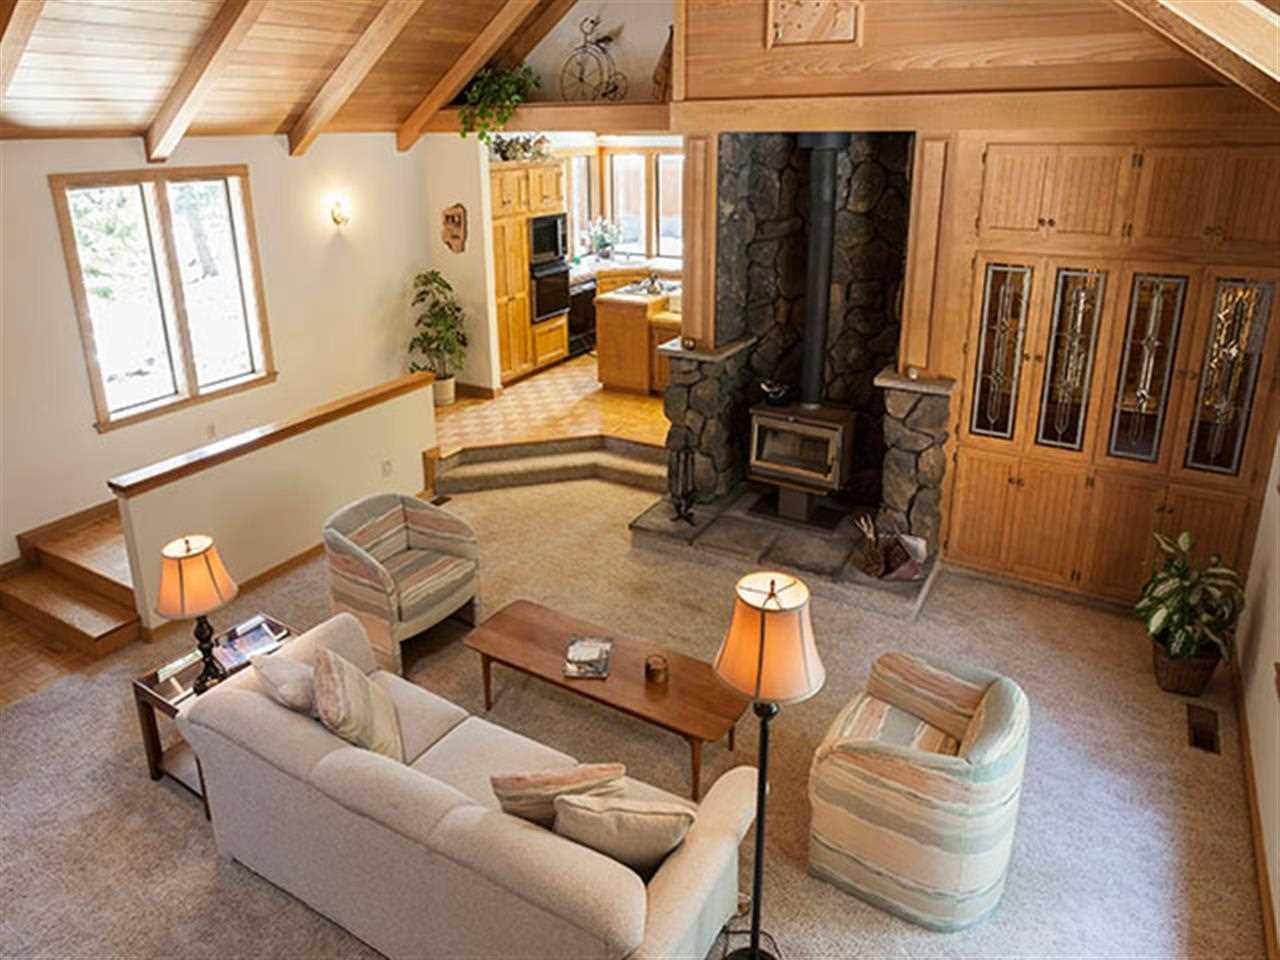 Additional photo for property listing at 14492 Tyrol Road 14492 Tyrol Road Truckee, California 96161 Estados Unidos